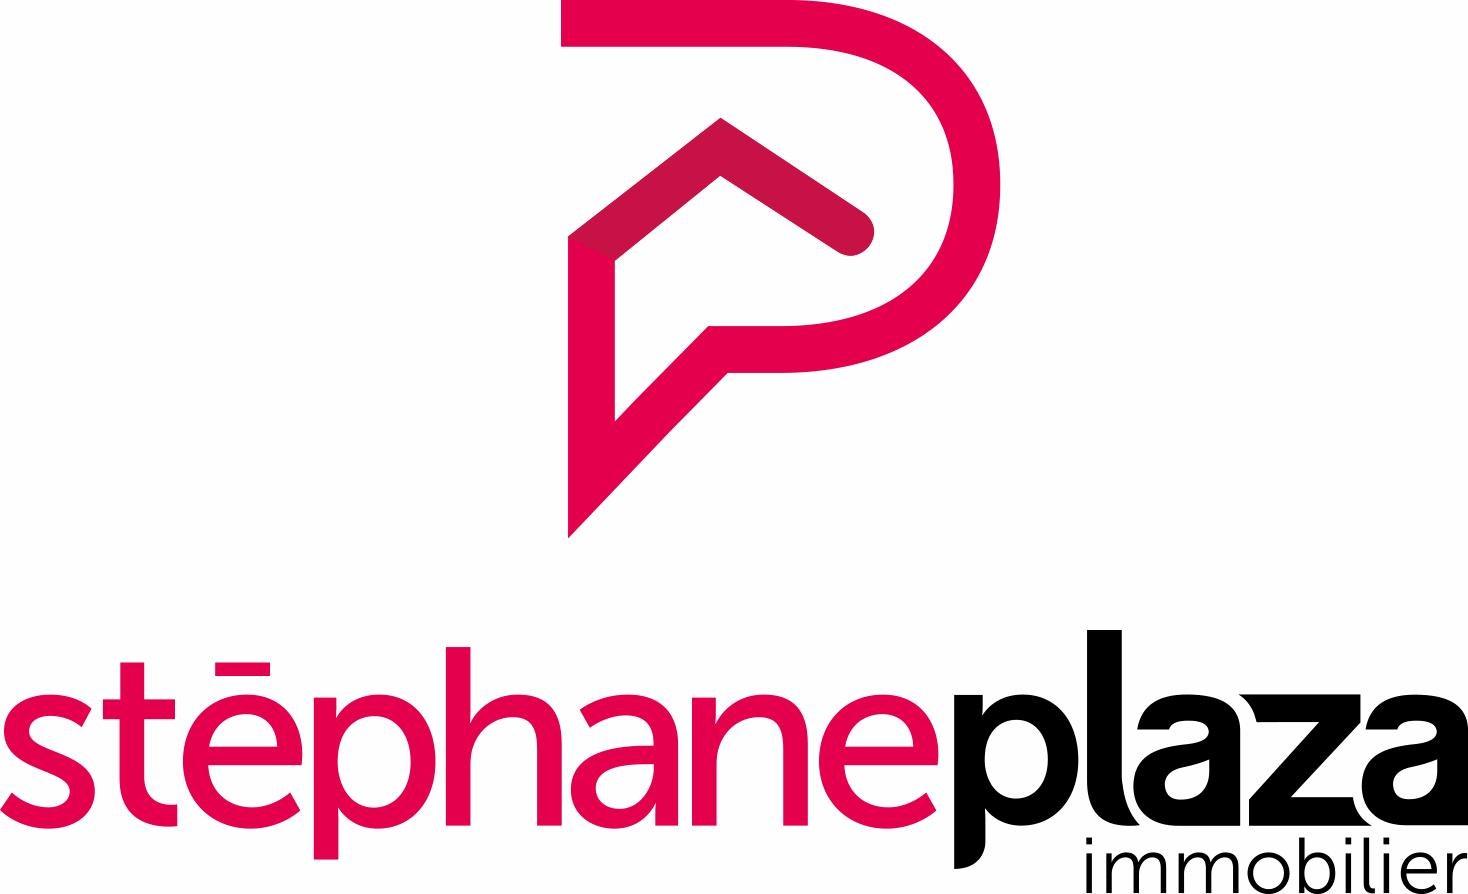 stephane plaza immobilier lyon terreaux croix rousse agence immobili re lyon 4. Black Bedroom Furniture Sets. Home Design Ideas